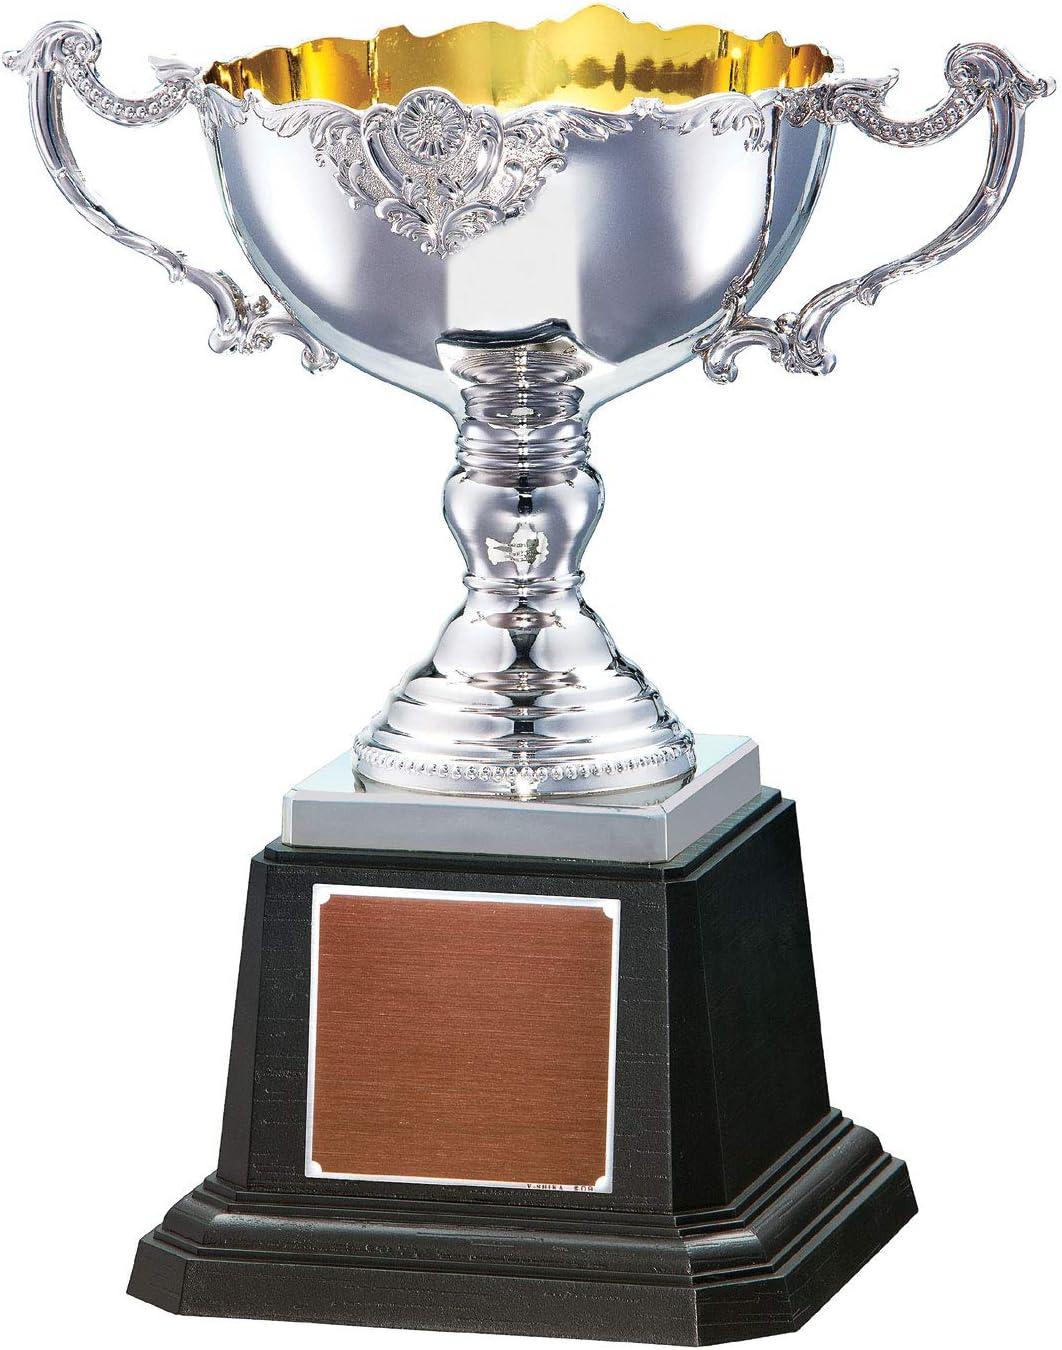 V-SHIKA ノーブルカップ NO.2114  Aサイズ 高さ:240mm 口径:125mm 重量:1050